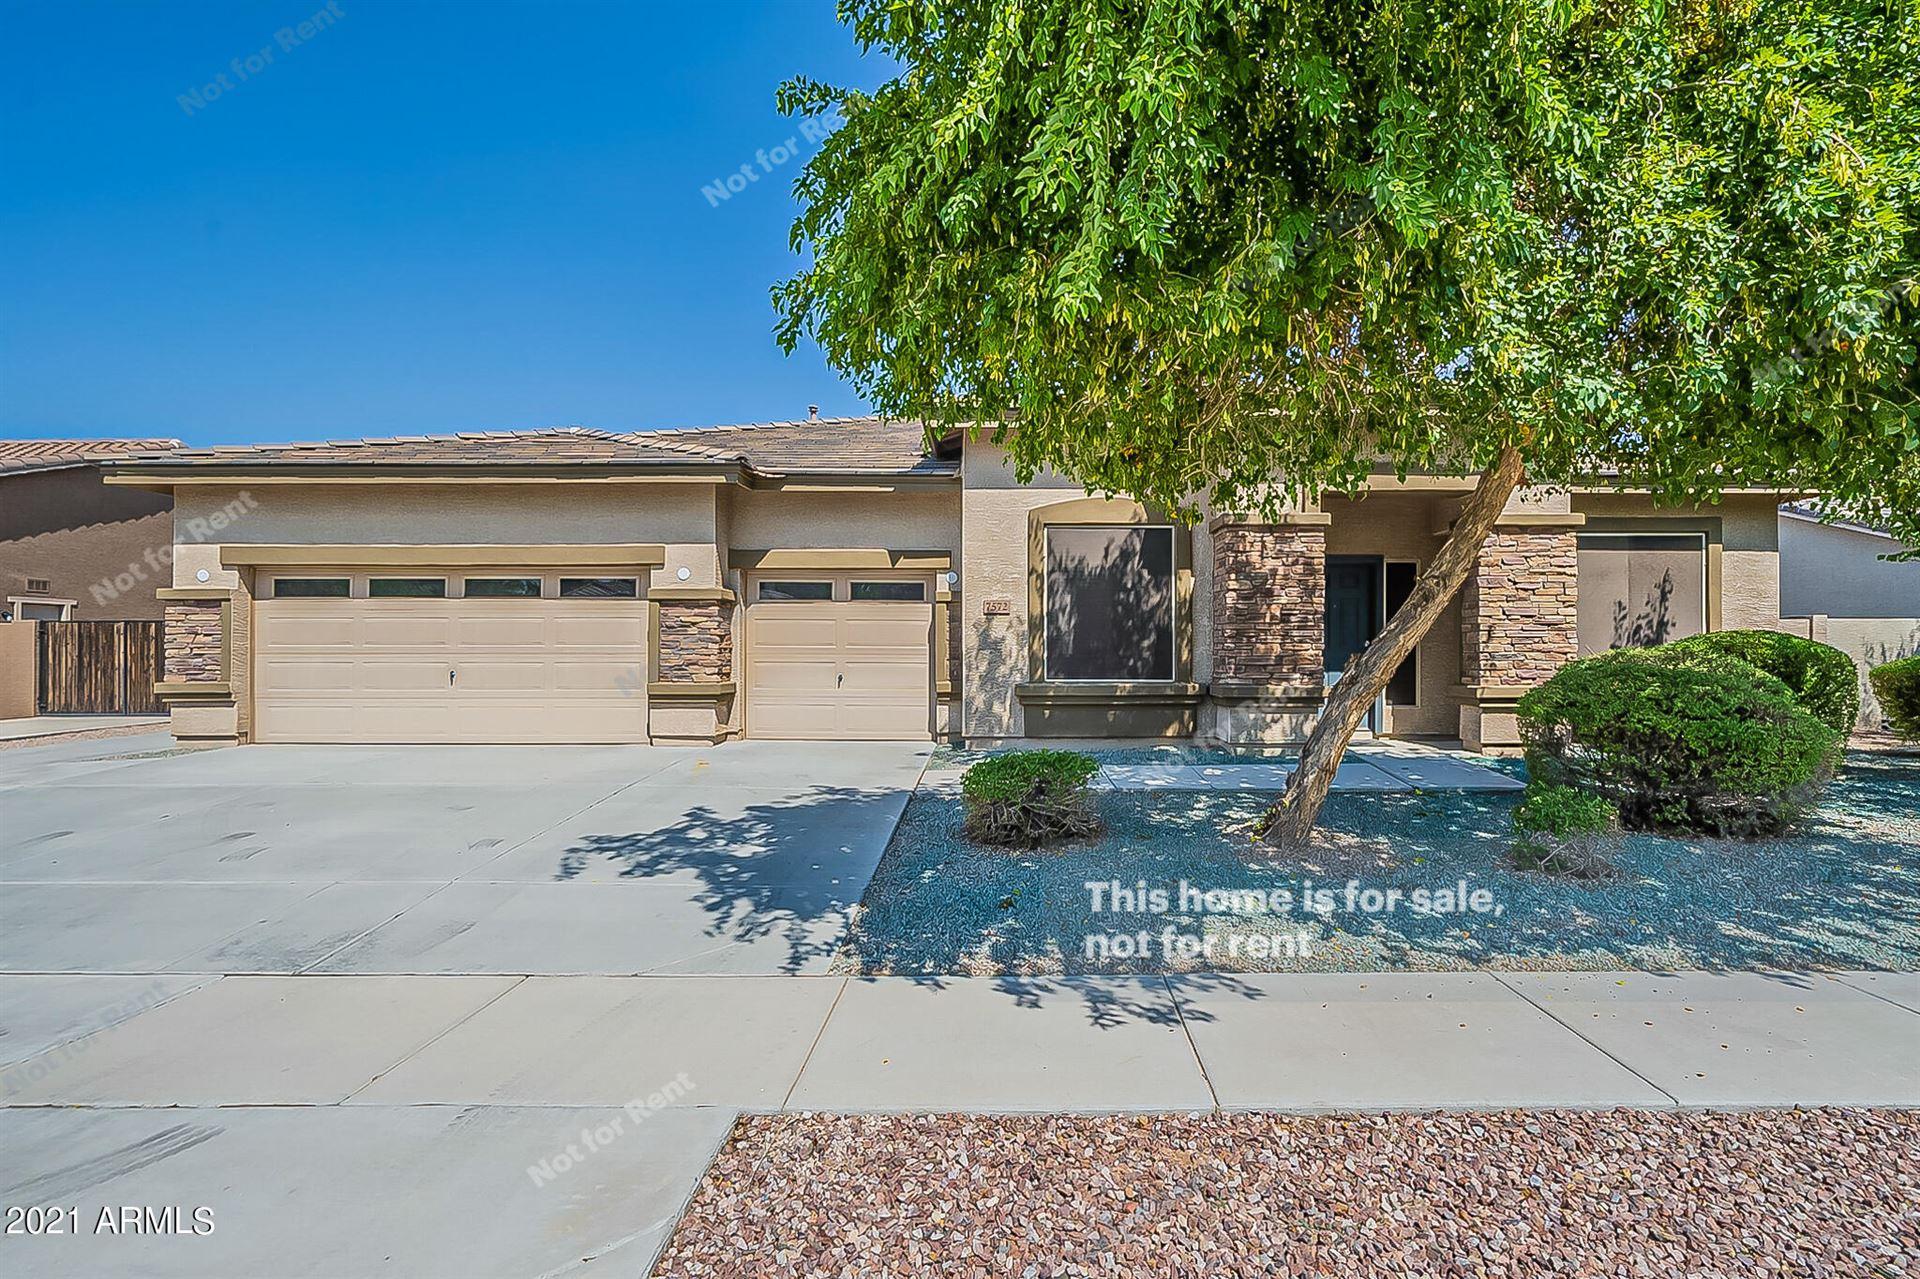 Photo of 7572 W KEIM Drive, Glendale, AZ 85303 (MLS # 6296028)